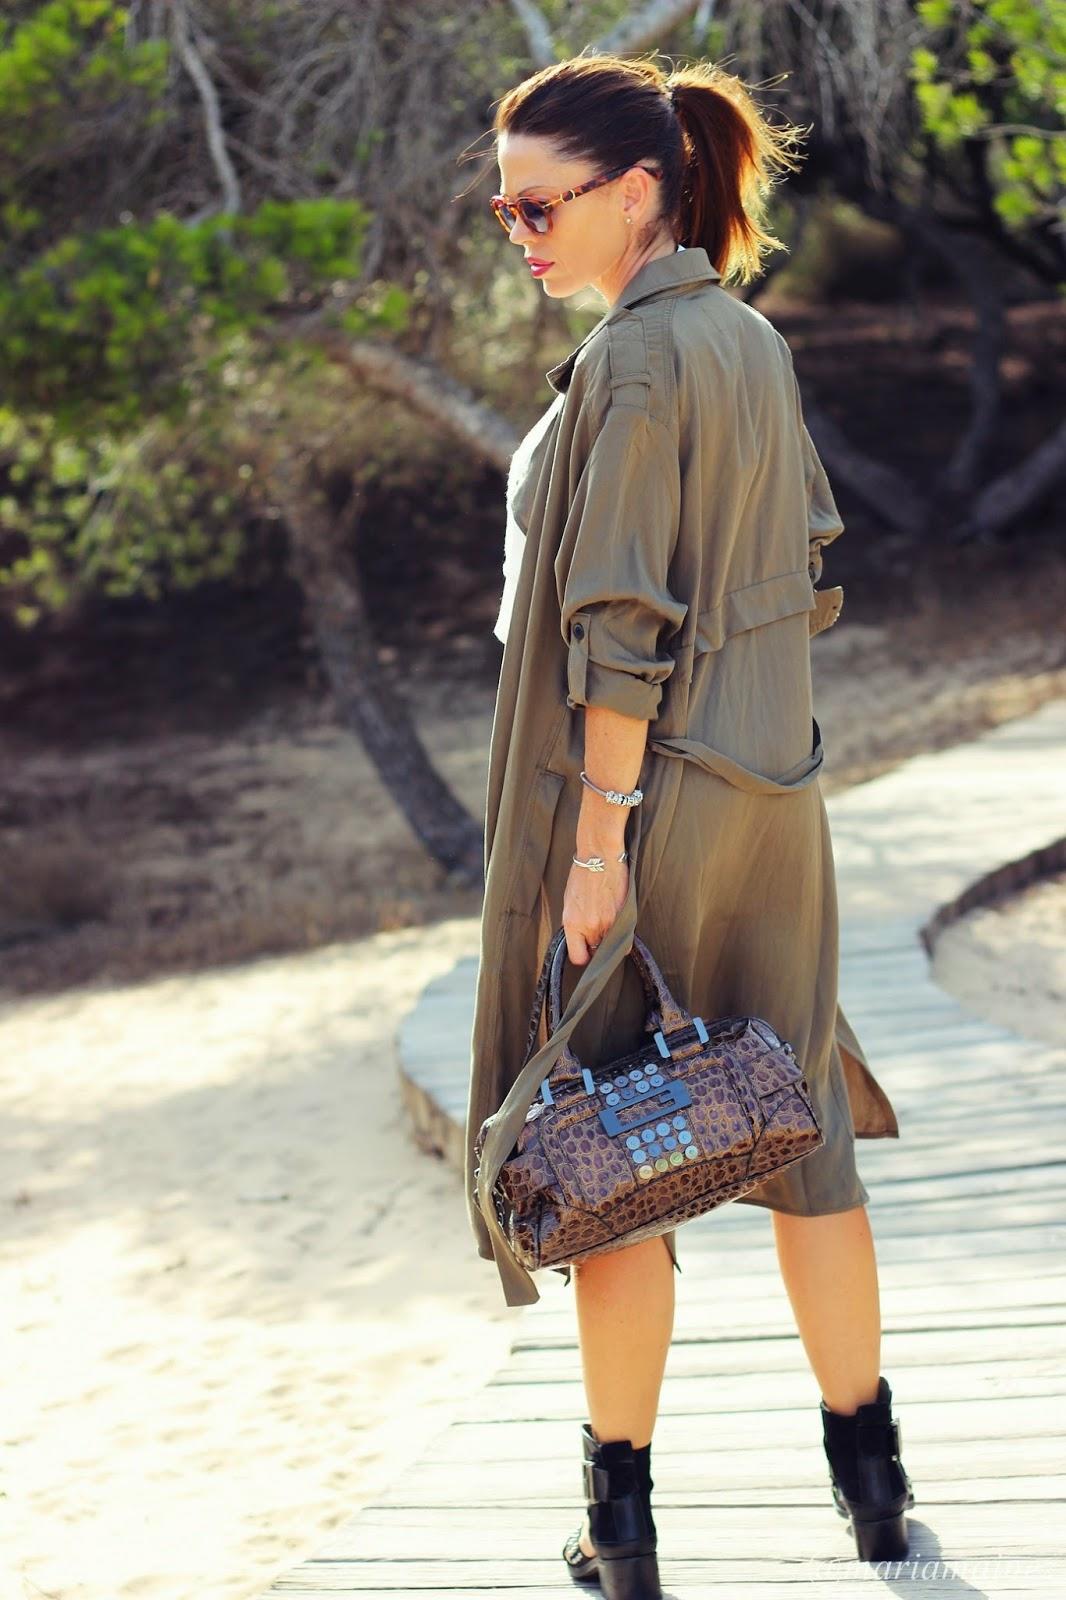 Outfit Otoño 2014 - Tendencia Maxi blazer - Verde militar - blogger Alicante - fashion blogger